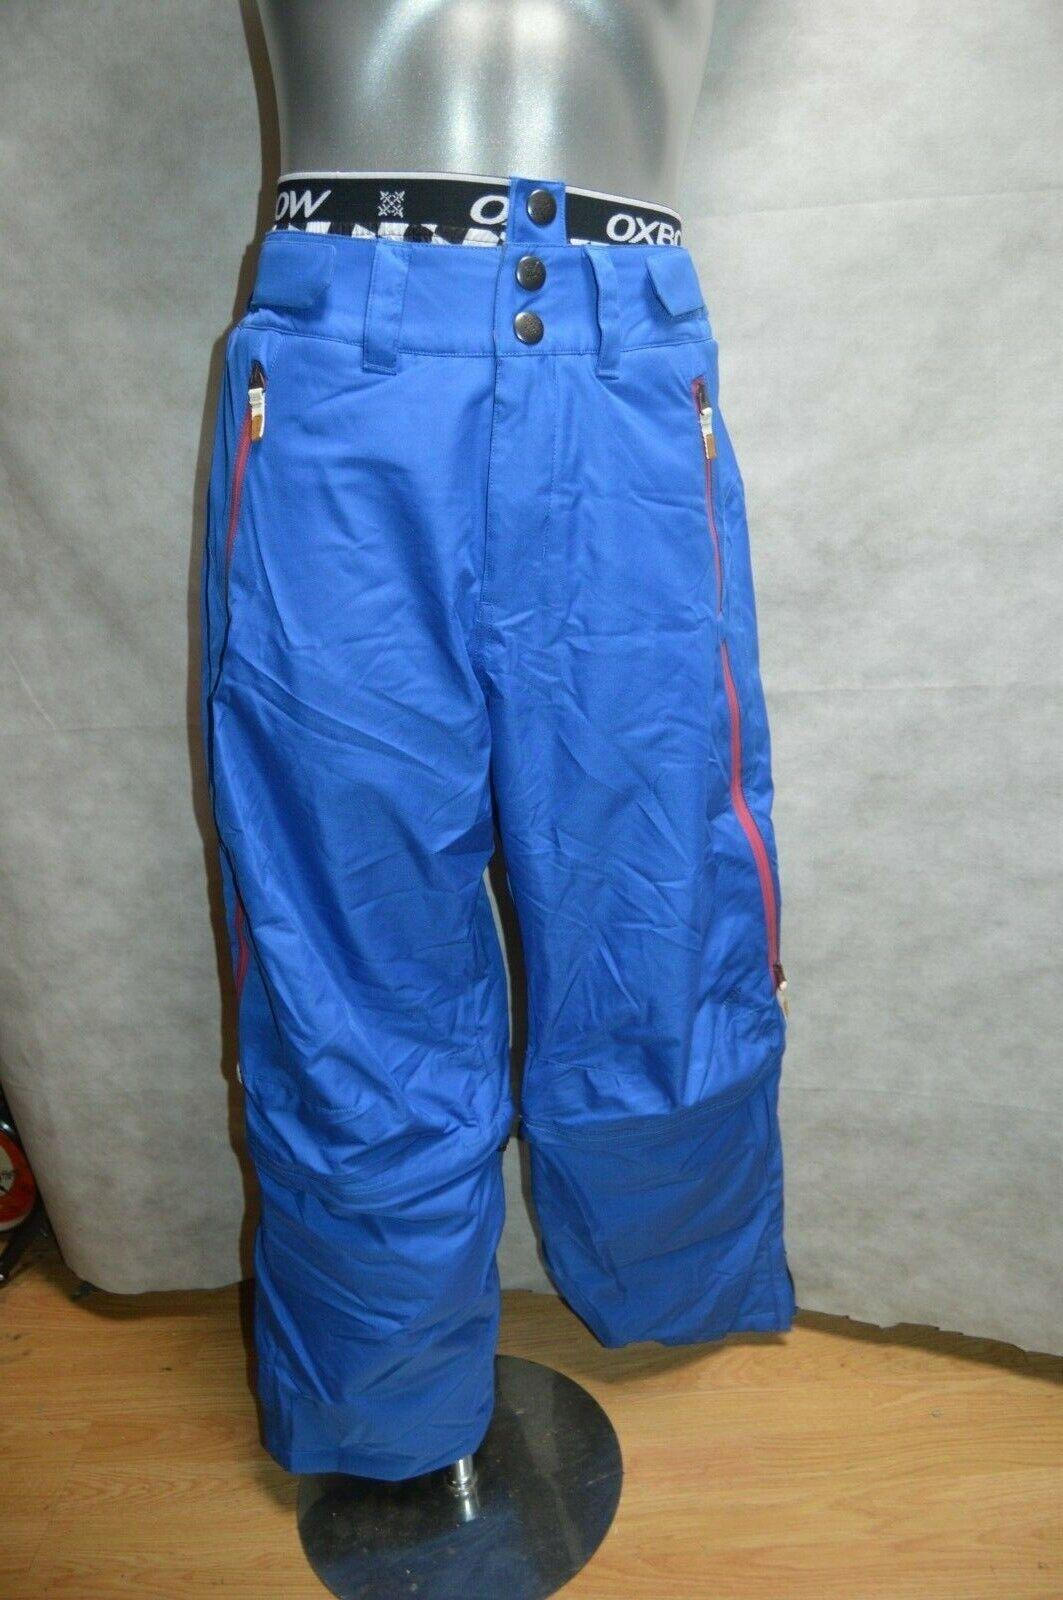 Snowboard pant oxbow  salamah size l pant pantaloni snow sci new  sale online discount low price